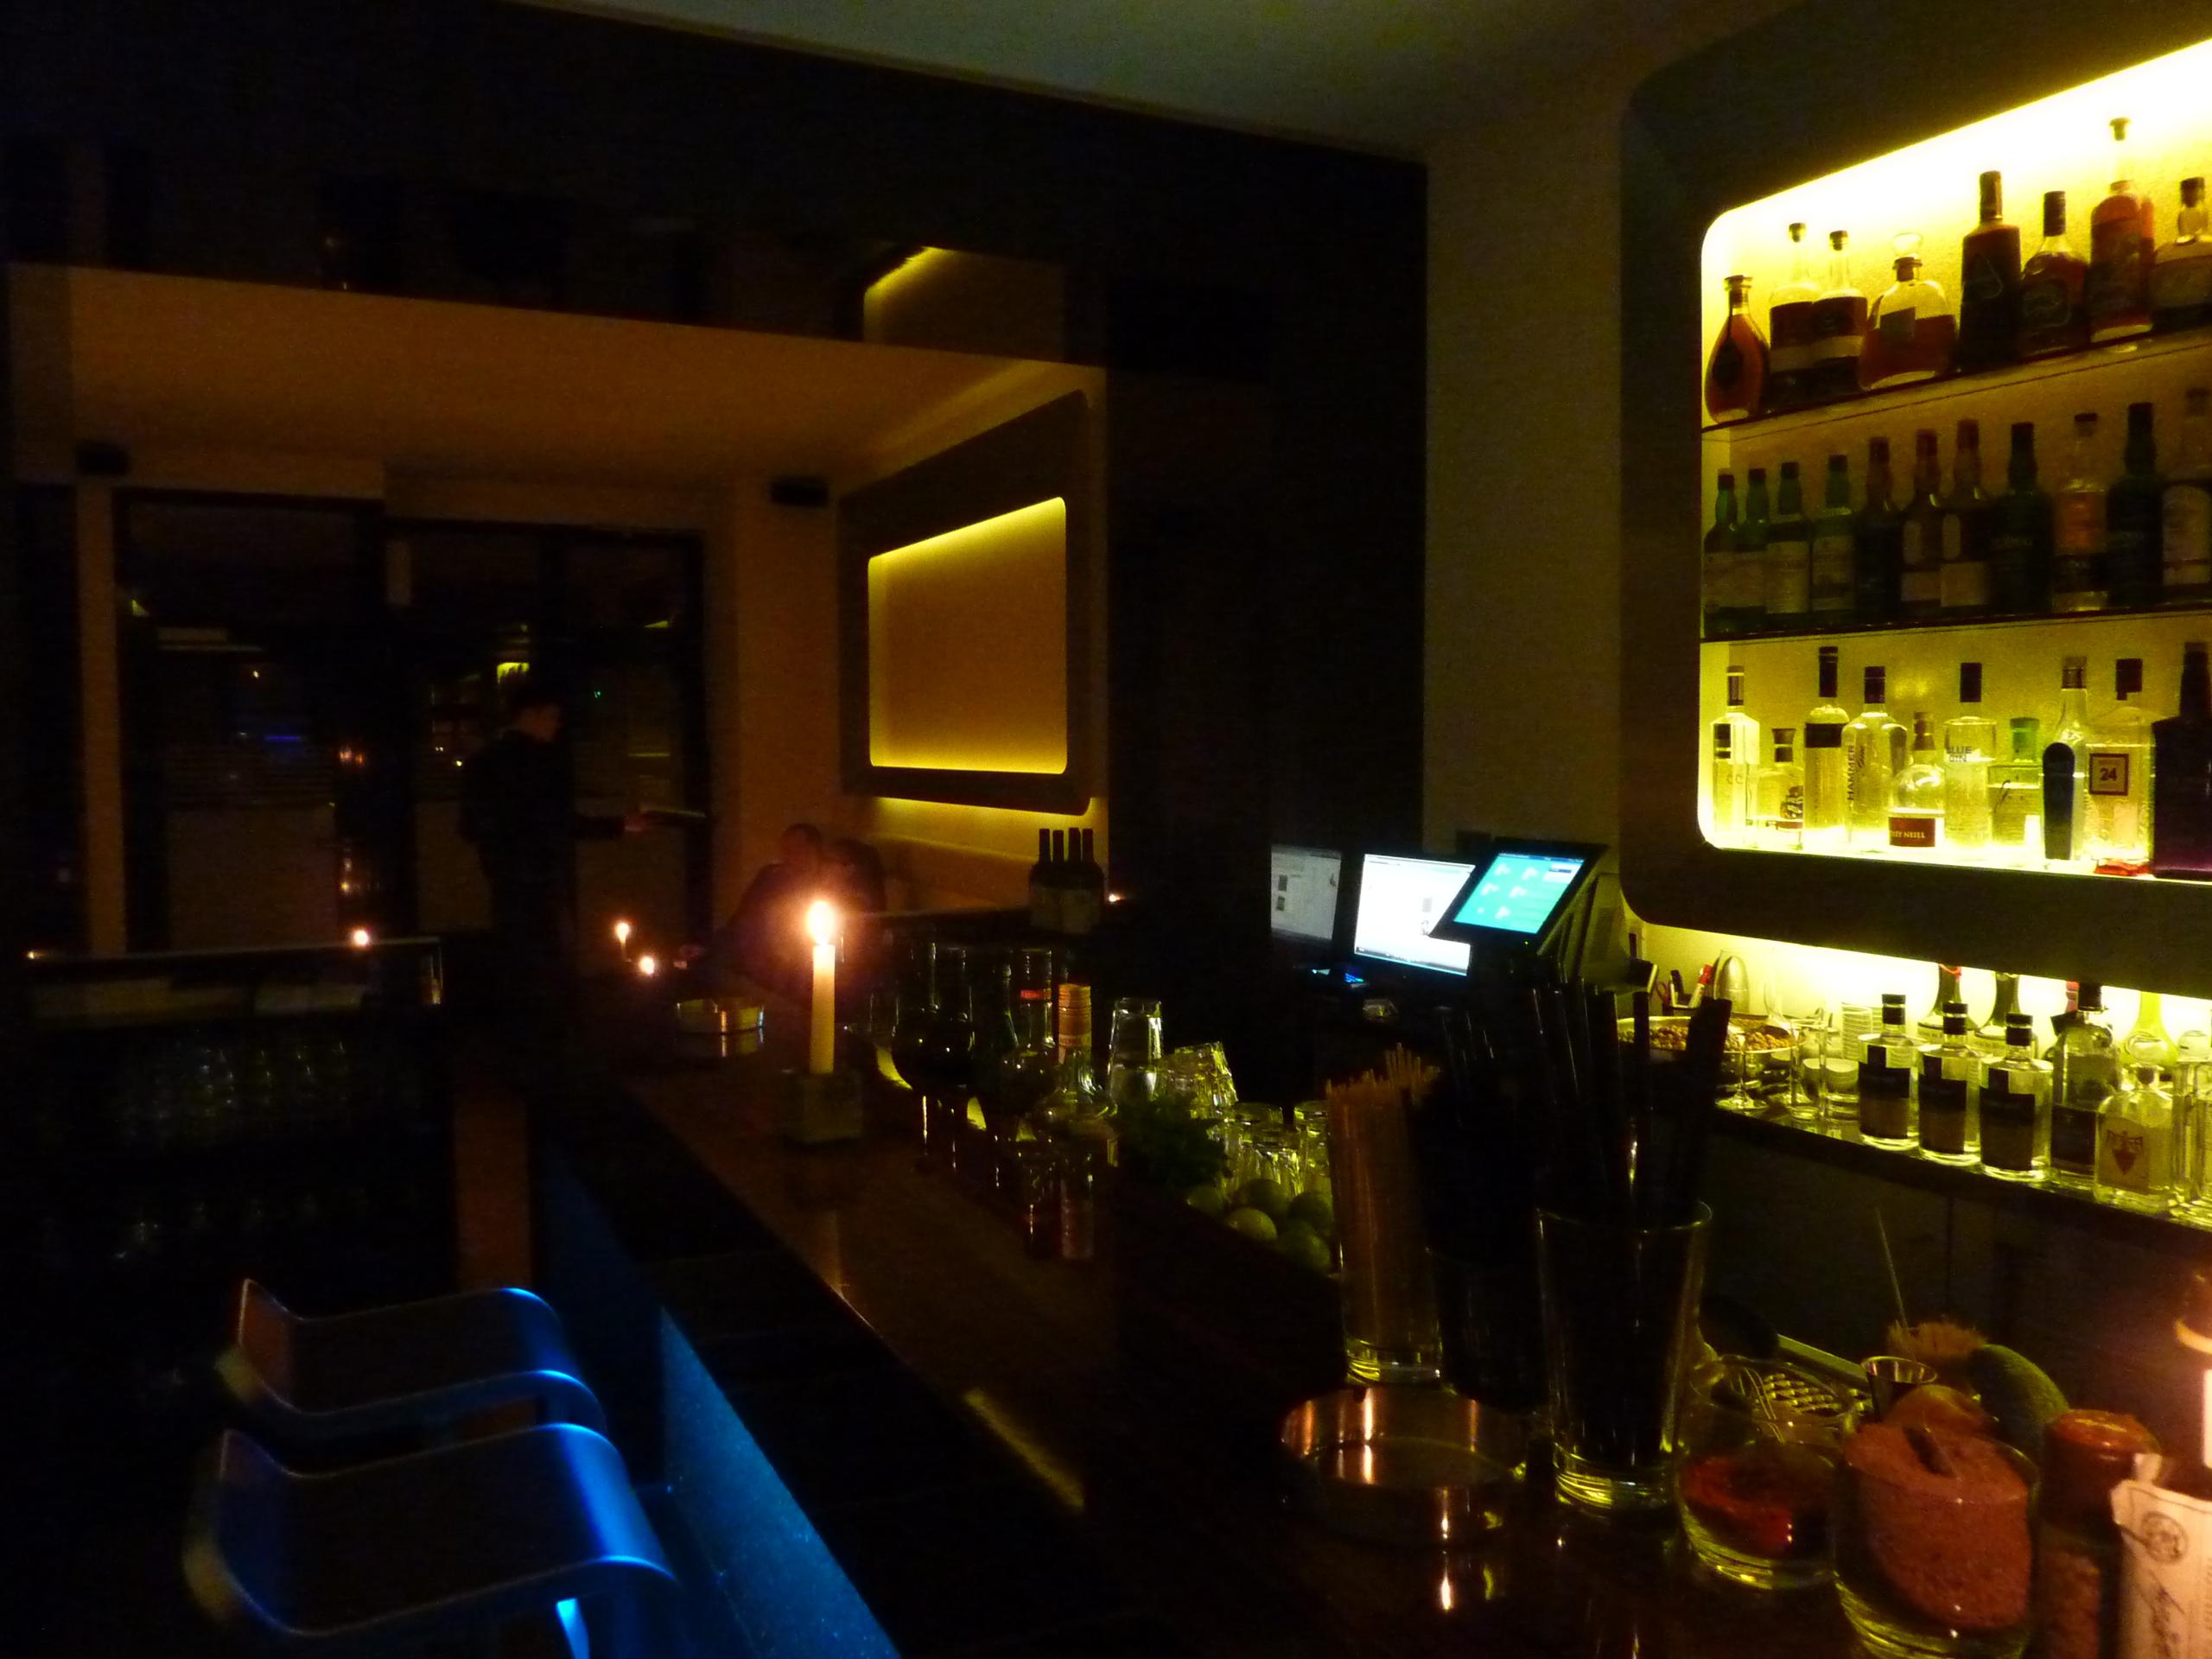 Vorne Lounge, hinten Bar